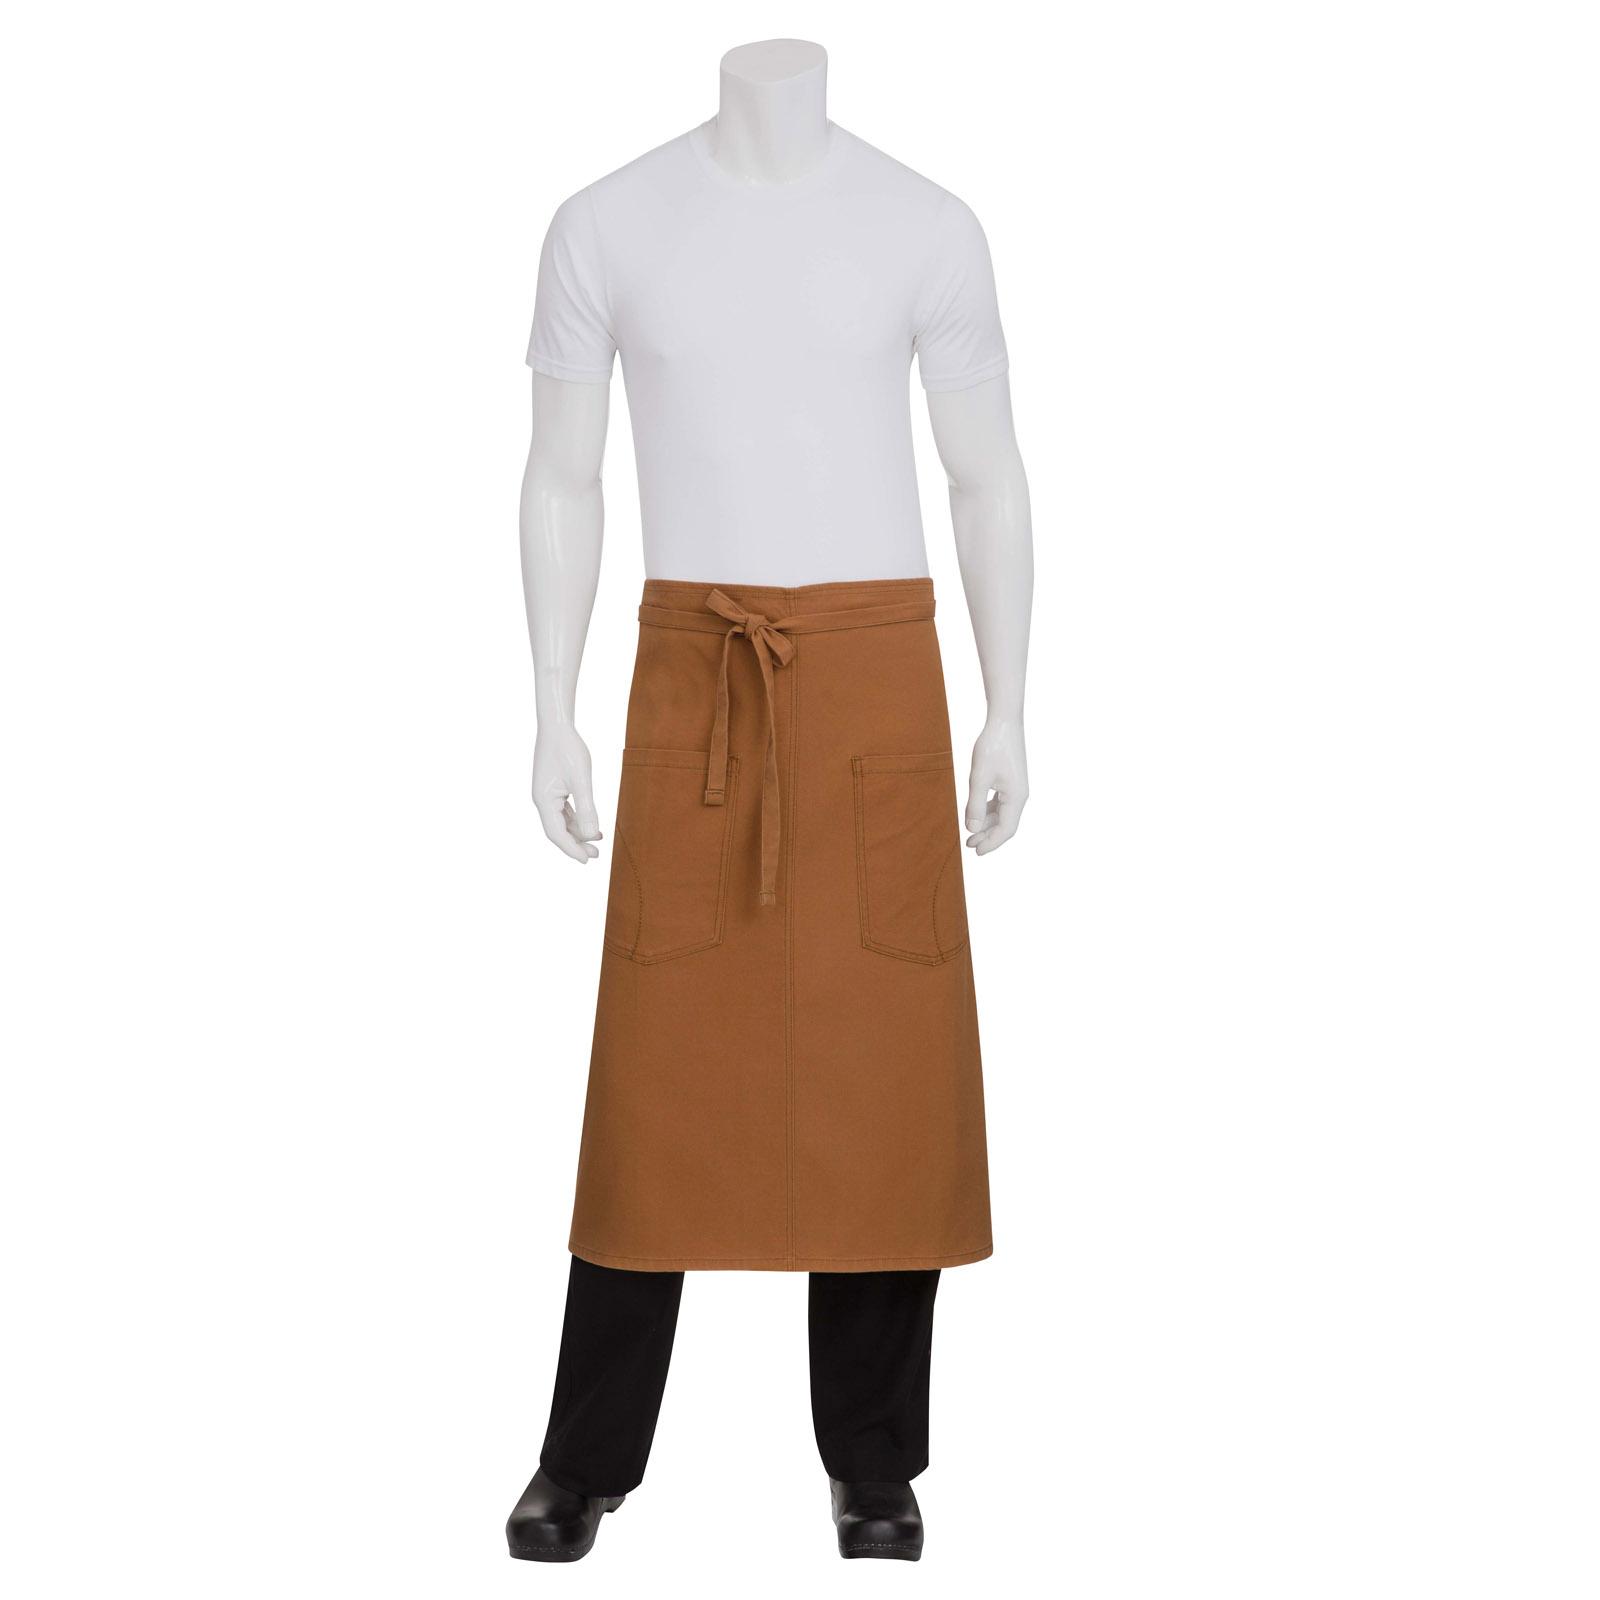 Chef Works ALWKV023NTM0 waist apron